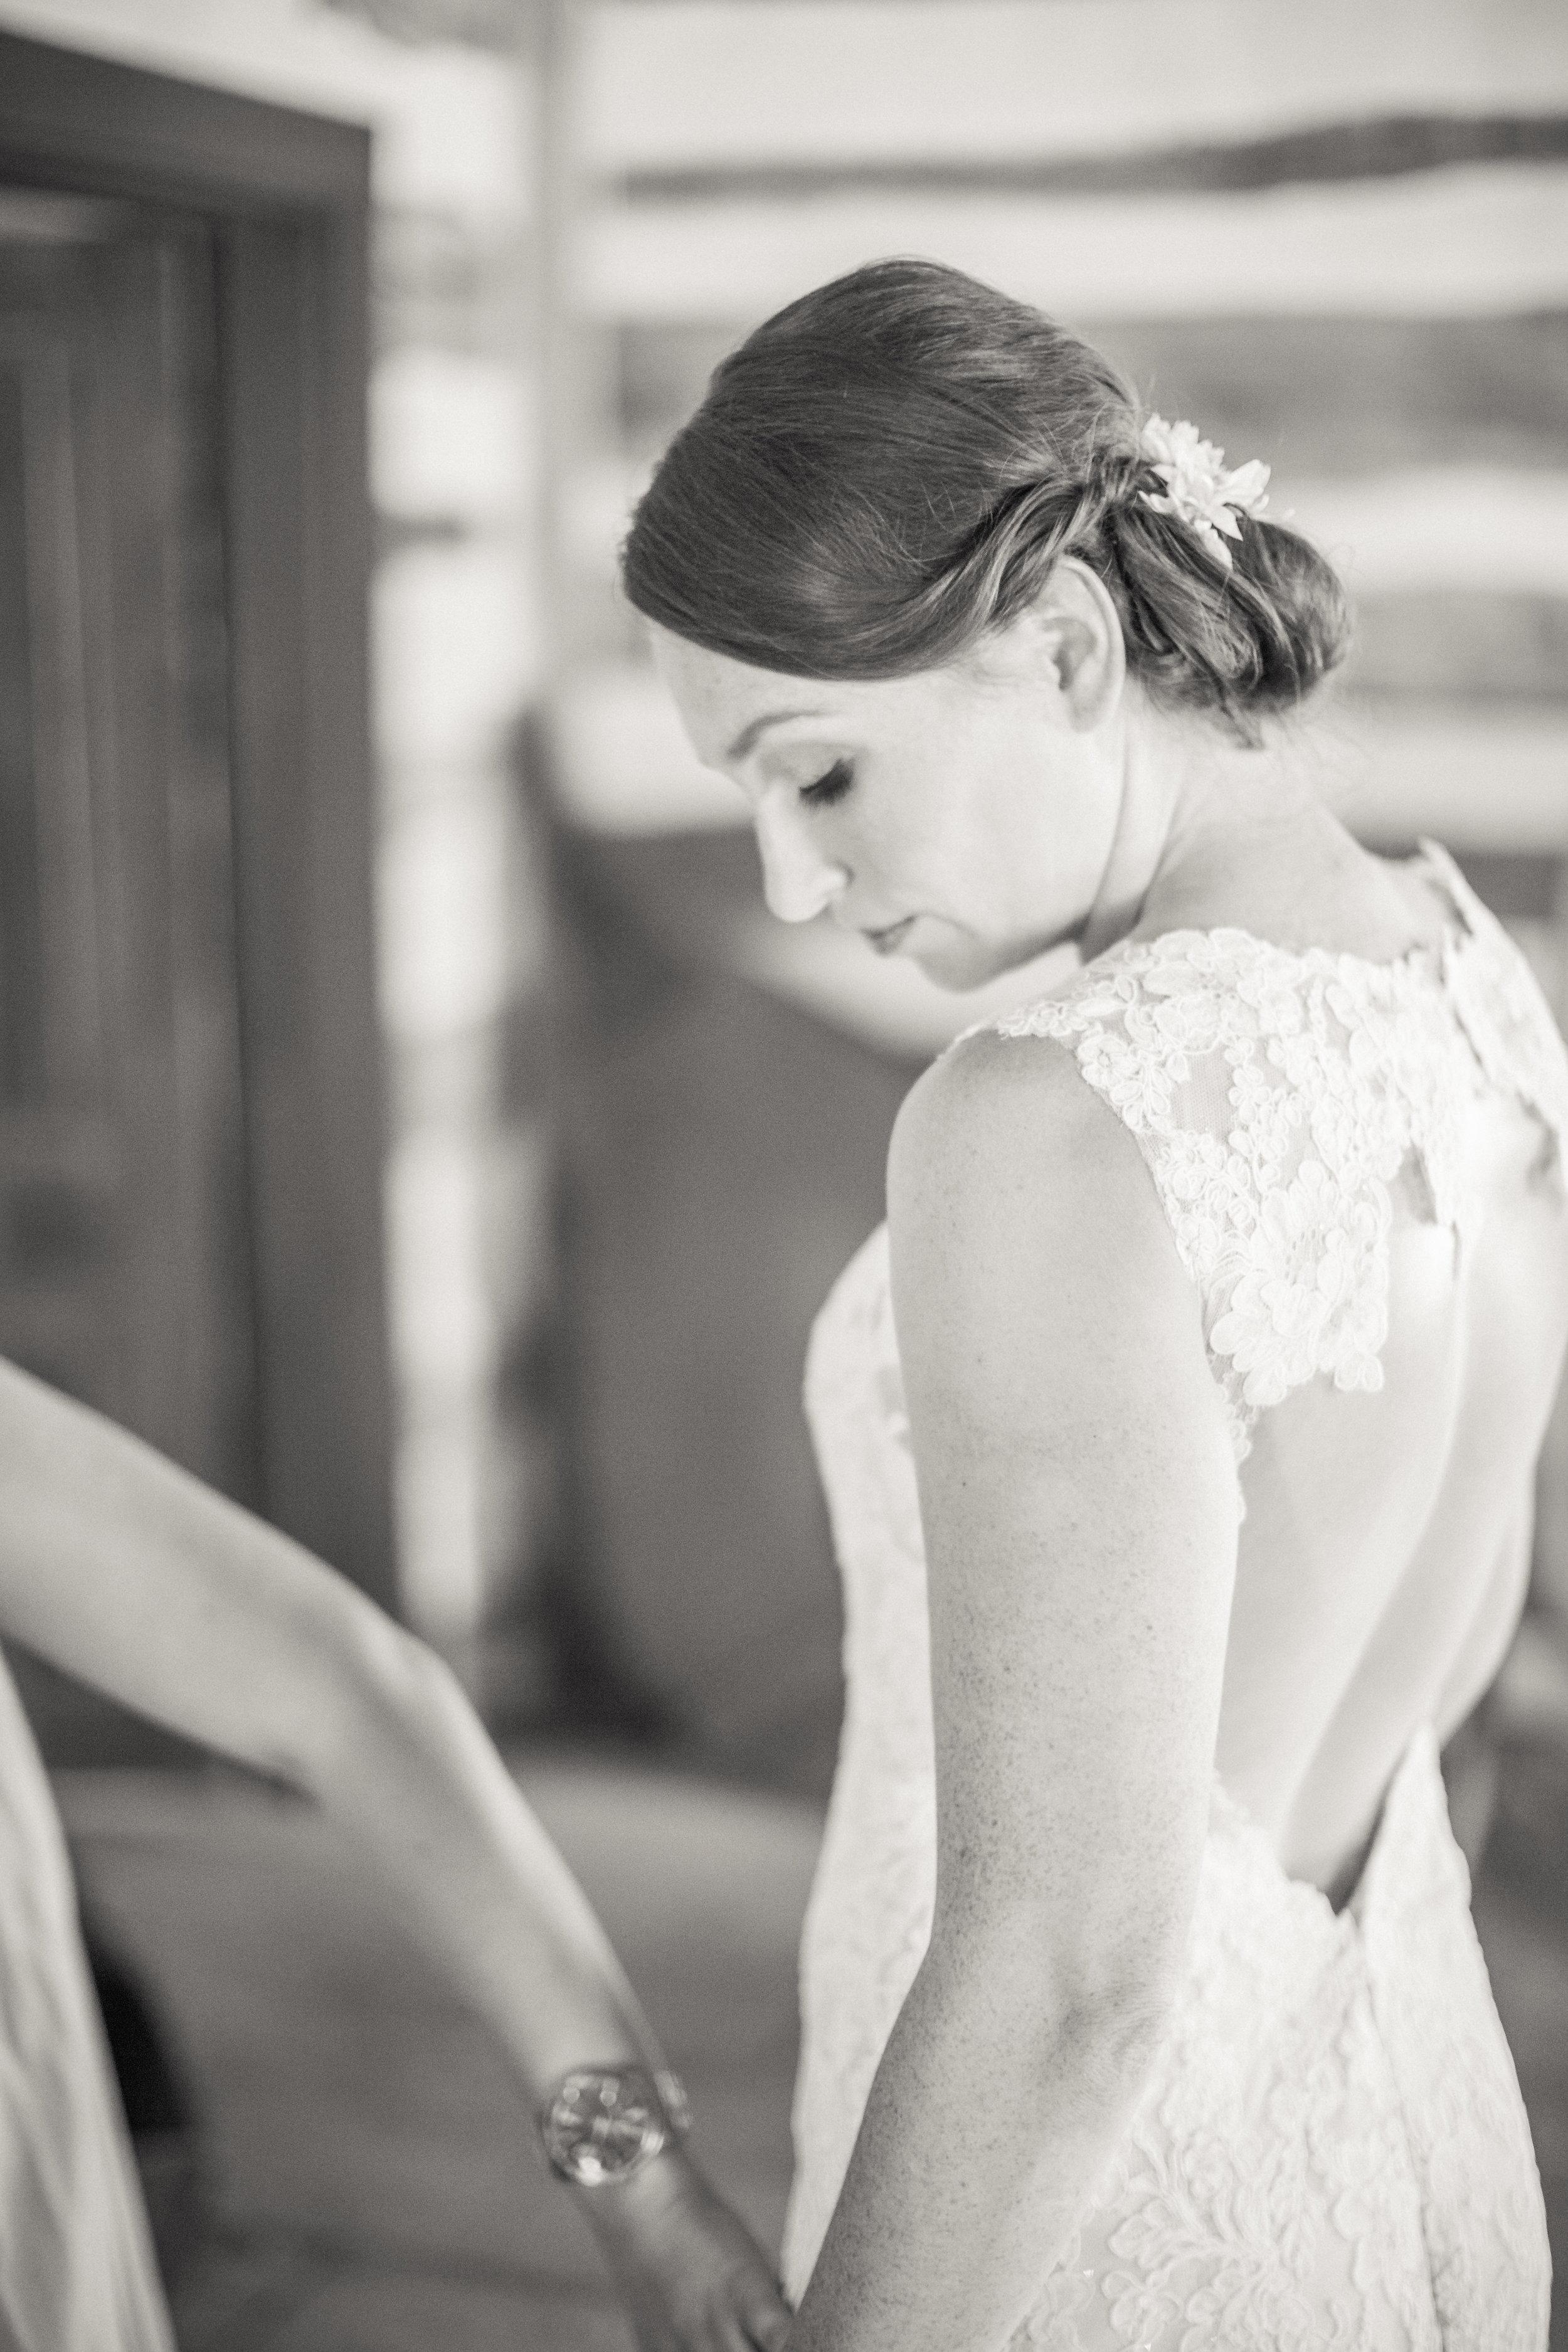 www.santabarbarawedding.com | Kiel Rucker Photography | Joelle Charming Wedding Planner | Figueroa Mountain Farmhouse | Wedding Dress